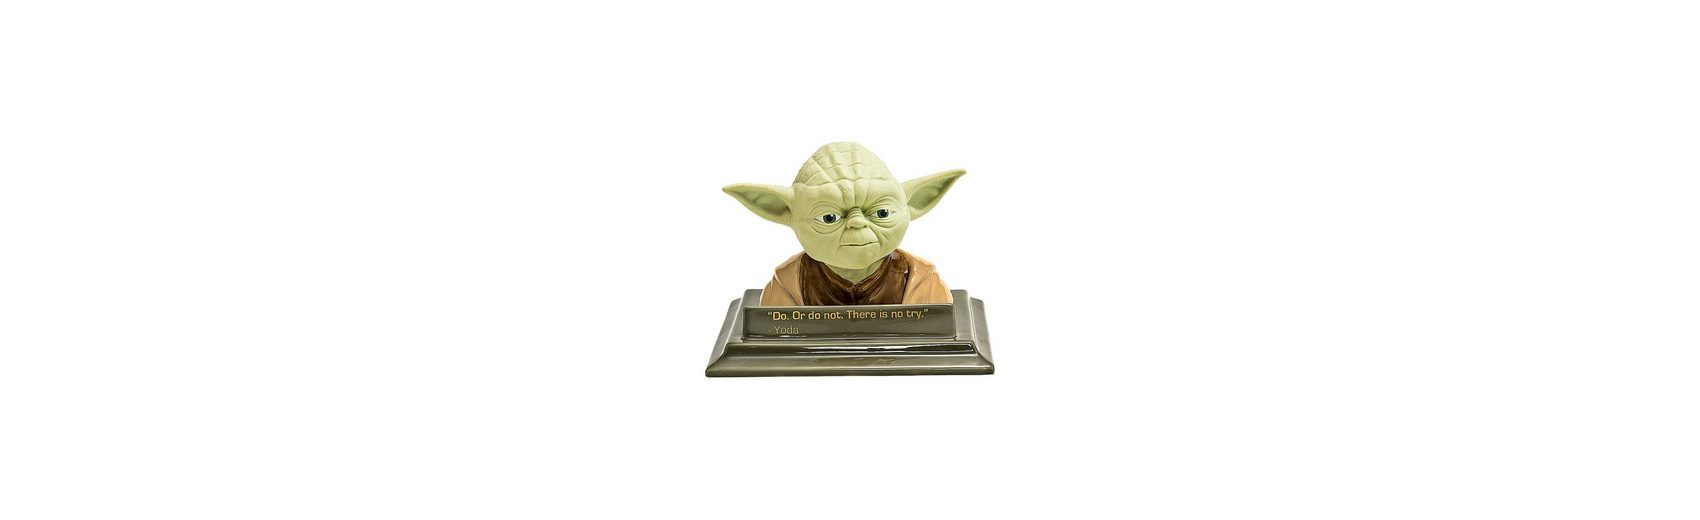 JOY TOY 3D-Büste Spardose Yoda Star Wars, Keramik